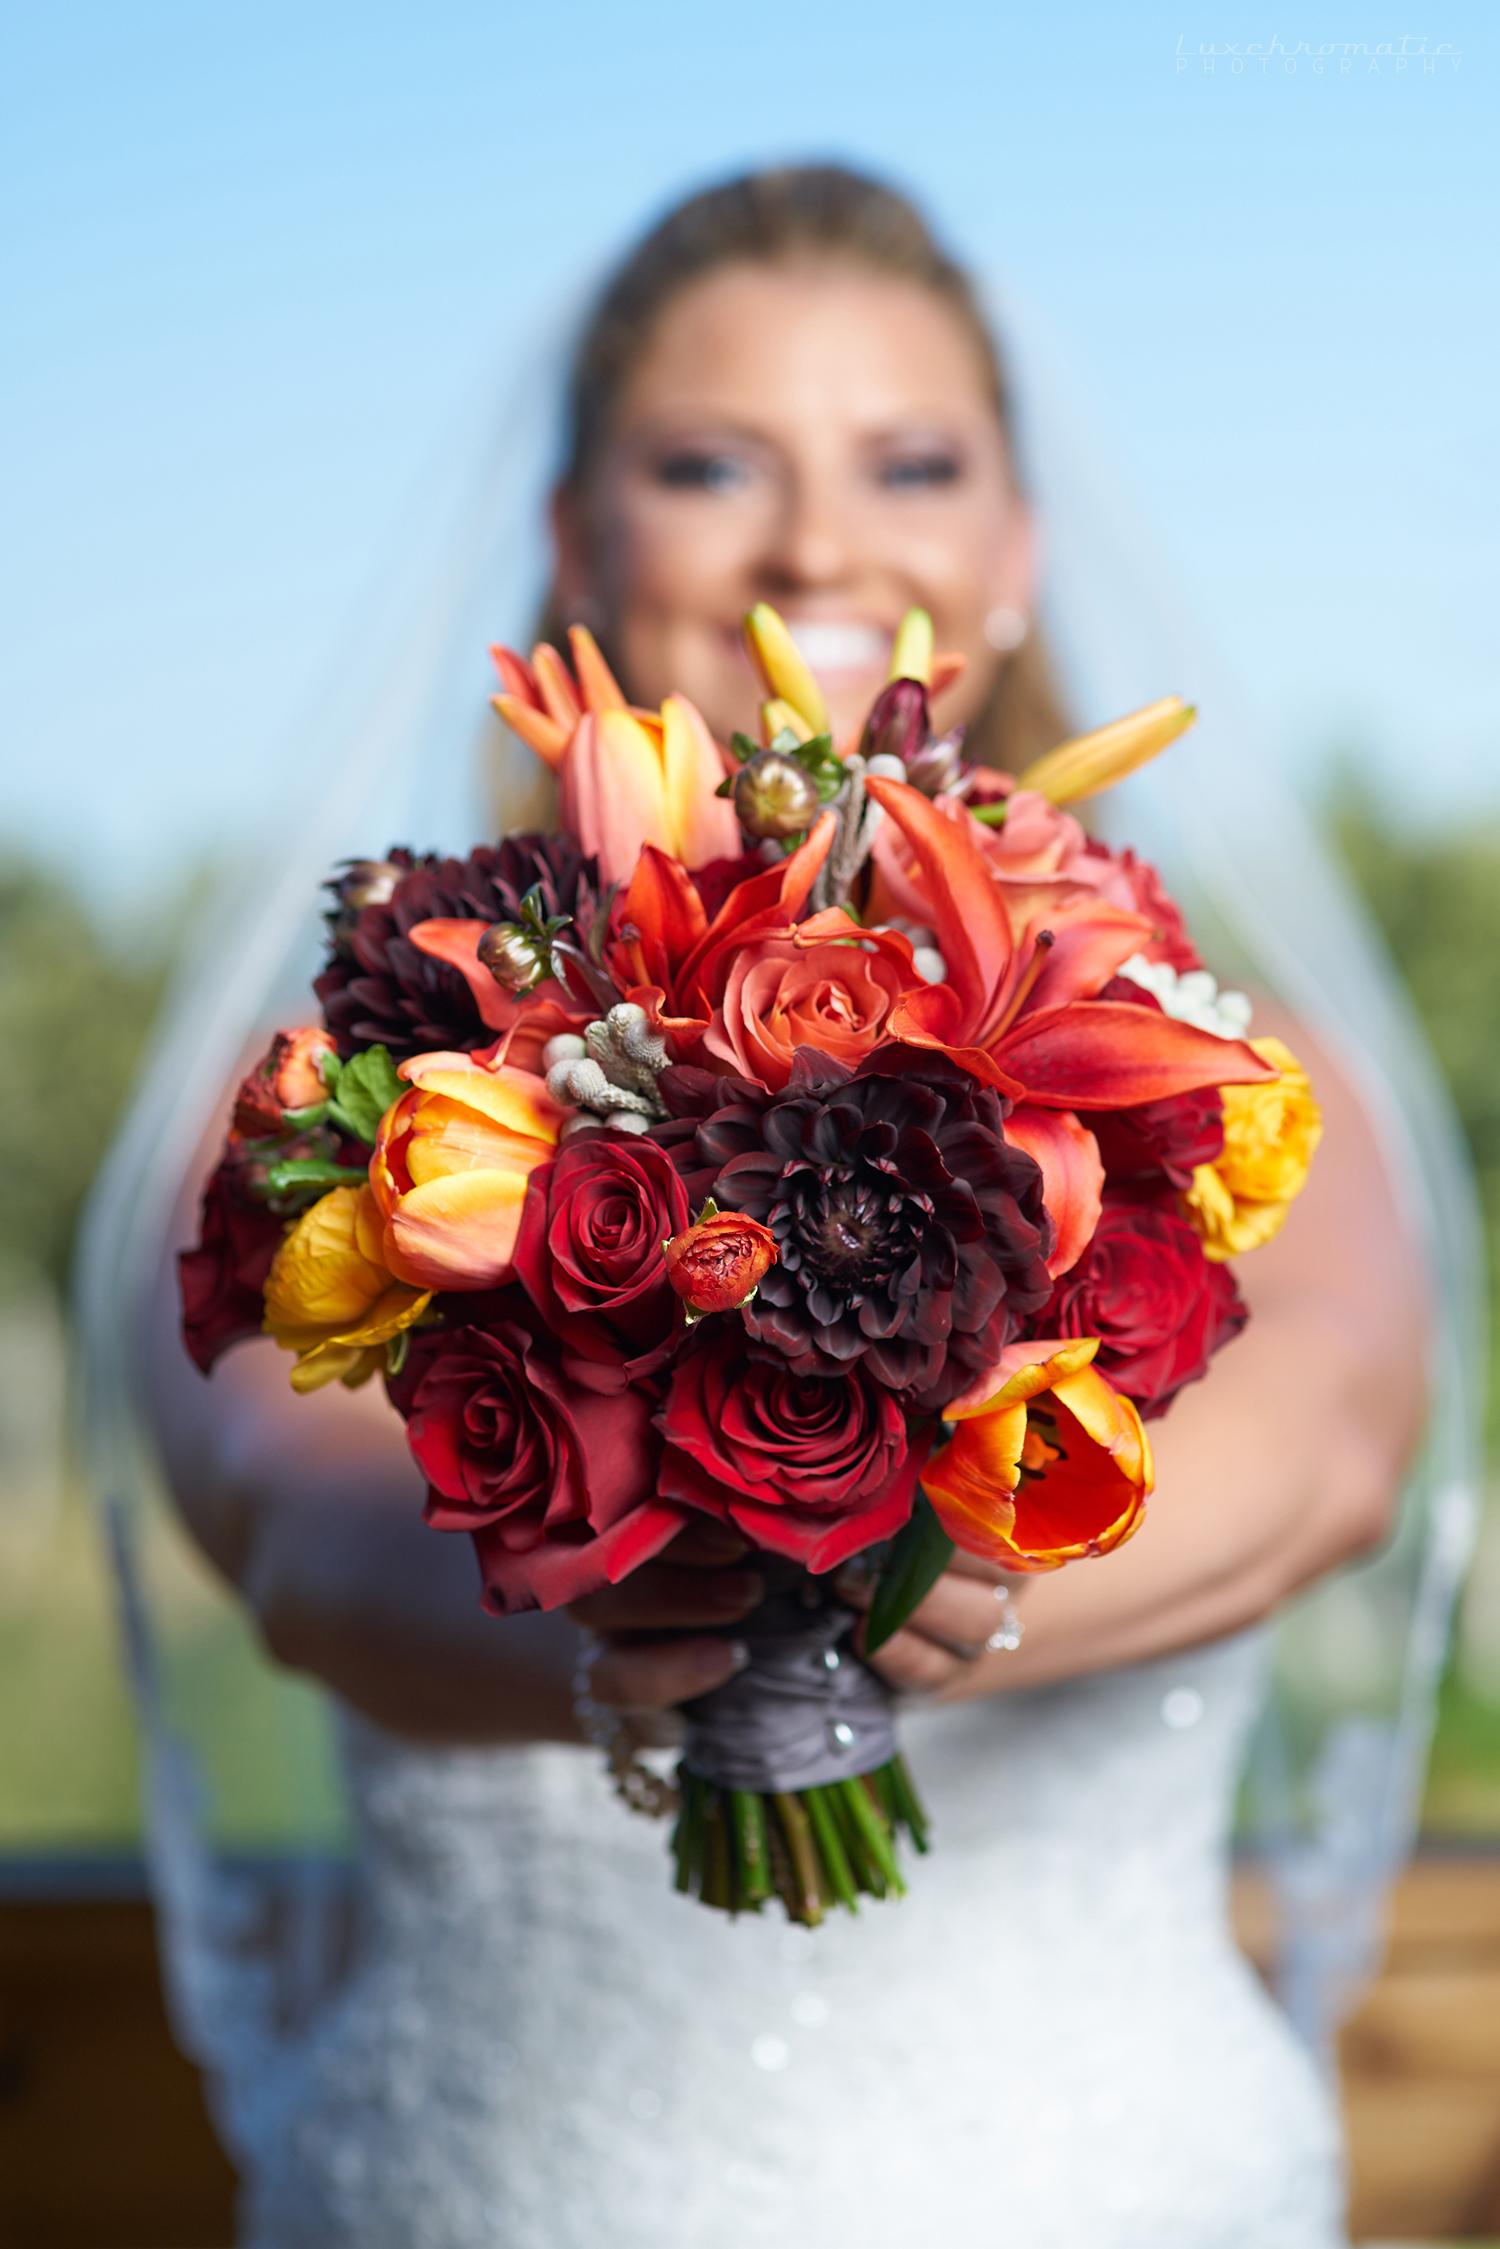 081217_Rachel_Chris_a0233-weddingdress-bride-weddingphotography-weddingphotographer-bridal-groom-wedding-engagementring-proposal-brides-diamondring-sonyalpha-sony-sonya9-sonya7rii-sanfrancisco-sf-bayarea-photographer-profoto-murrietas-well.jpg